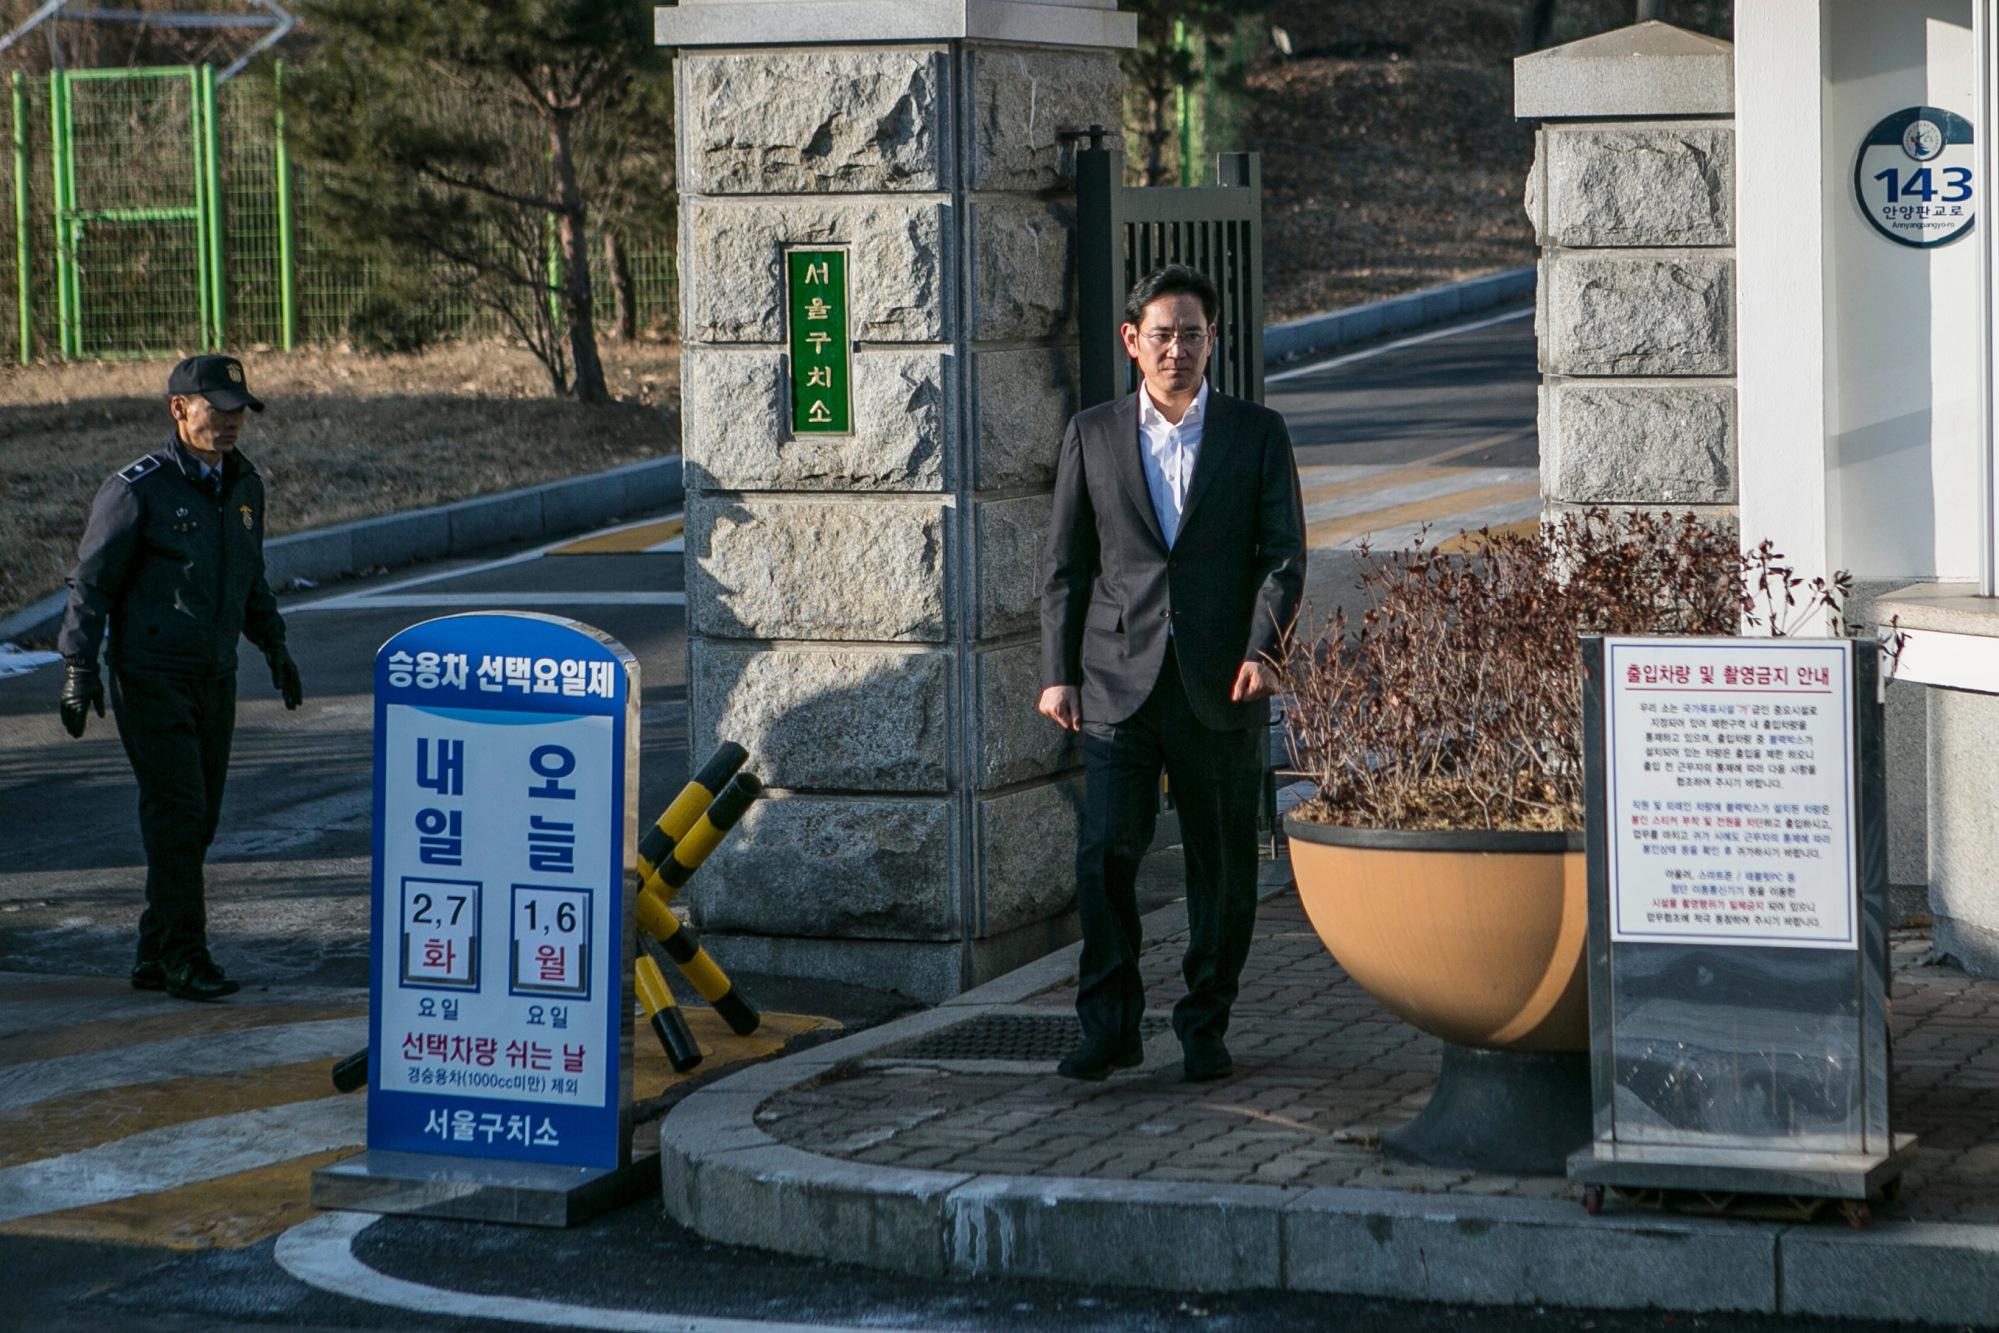 Vice Presidente da Samsung, Jay Y. Lee, libertado da prisão